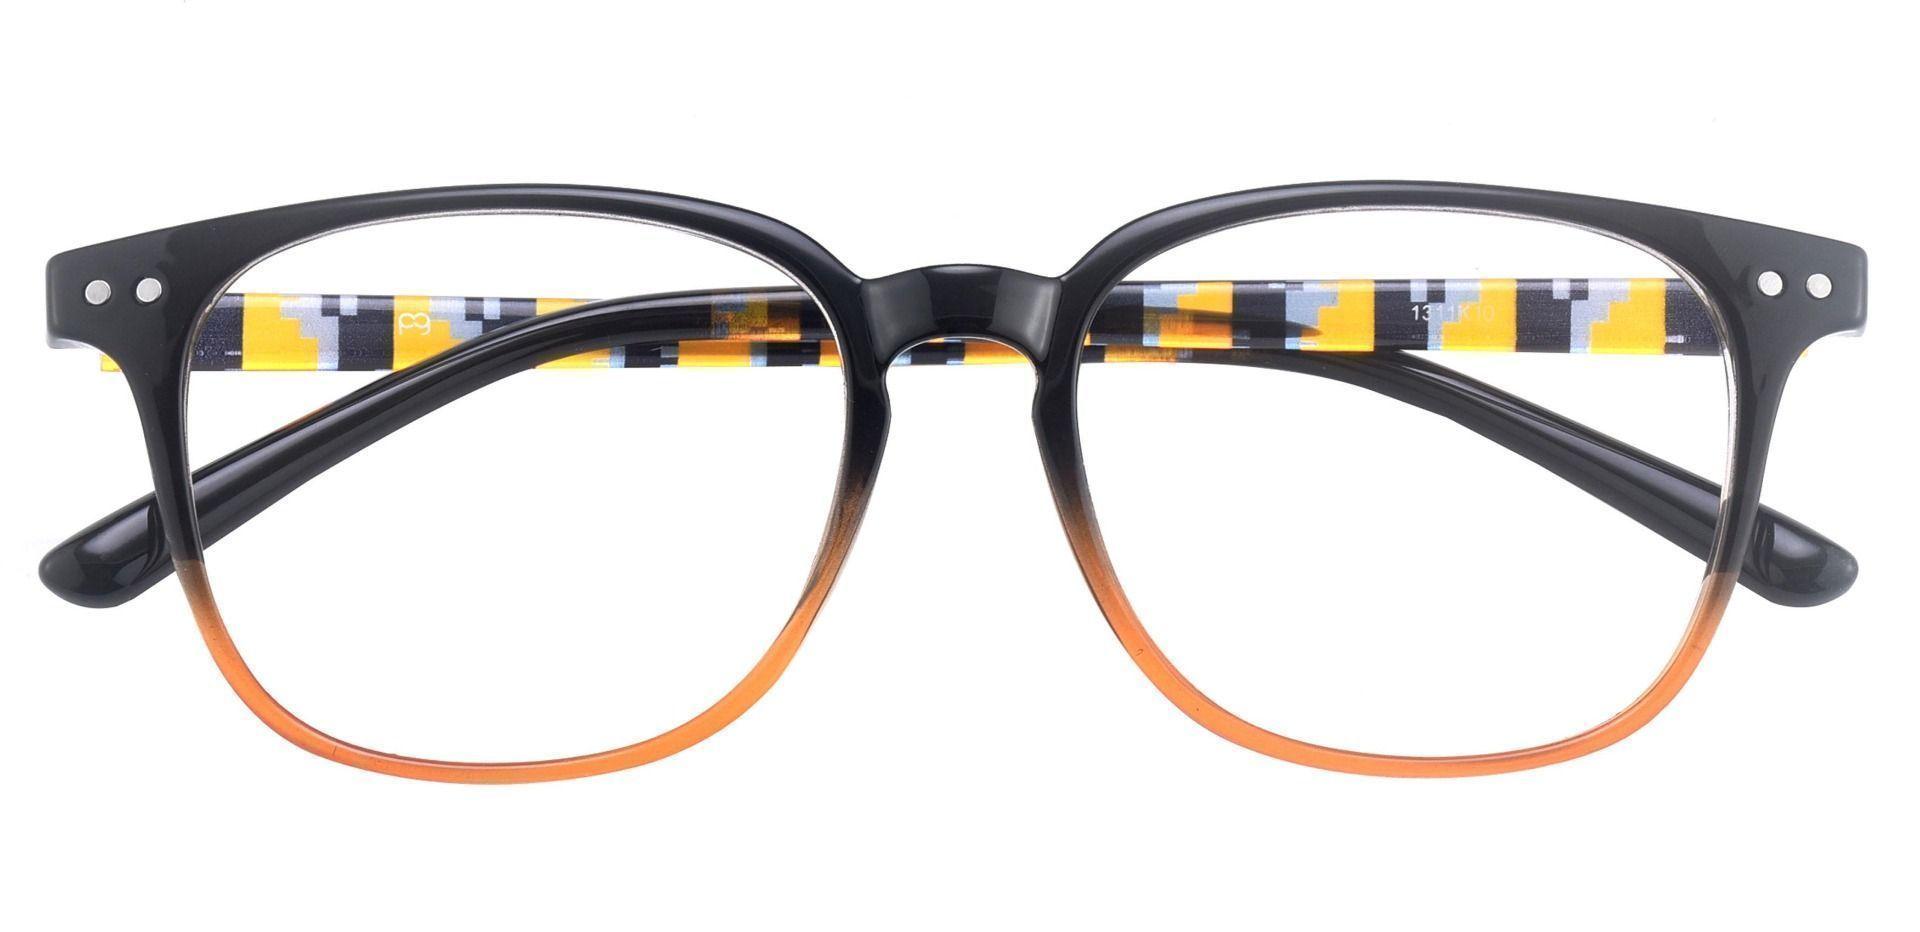 Ravine Oval Prescription Glasses - Black